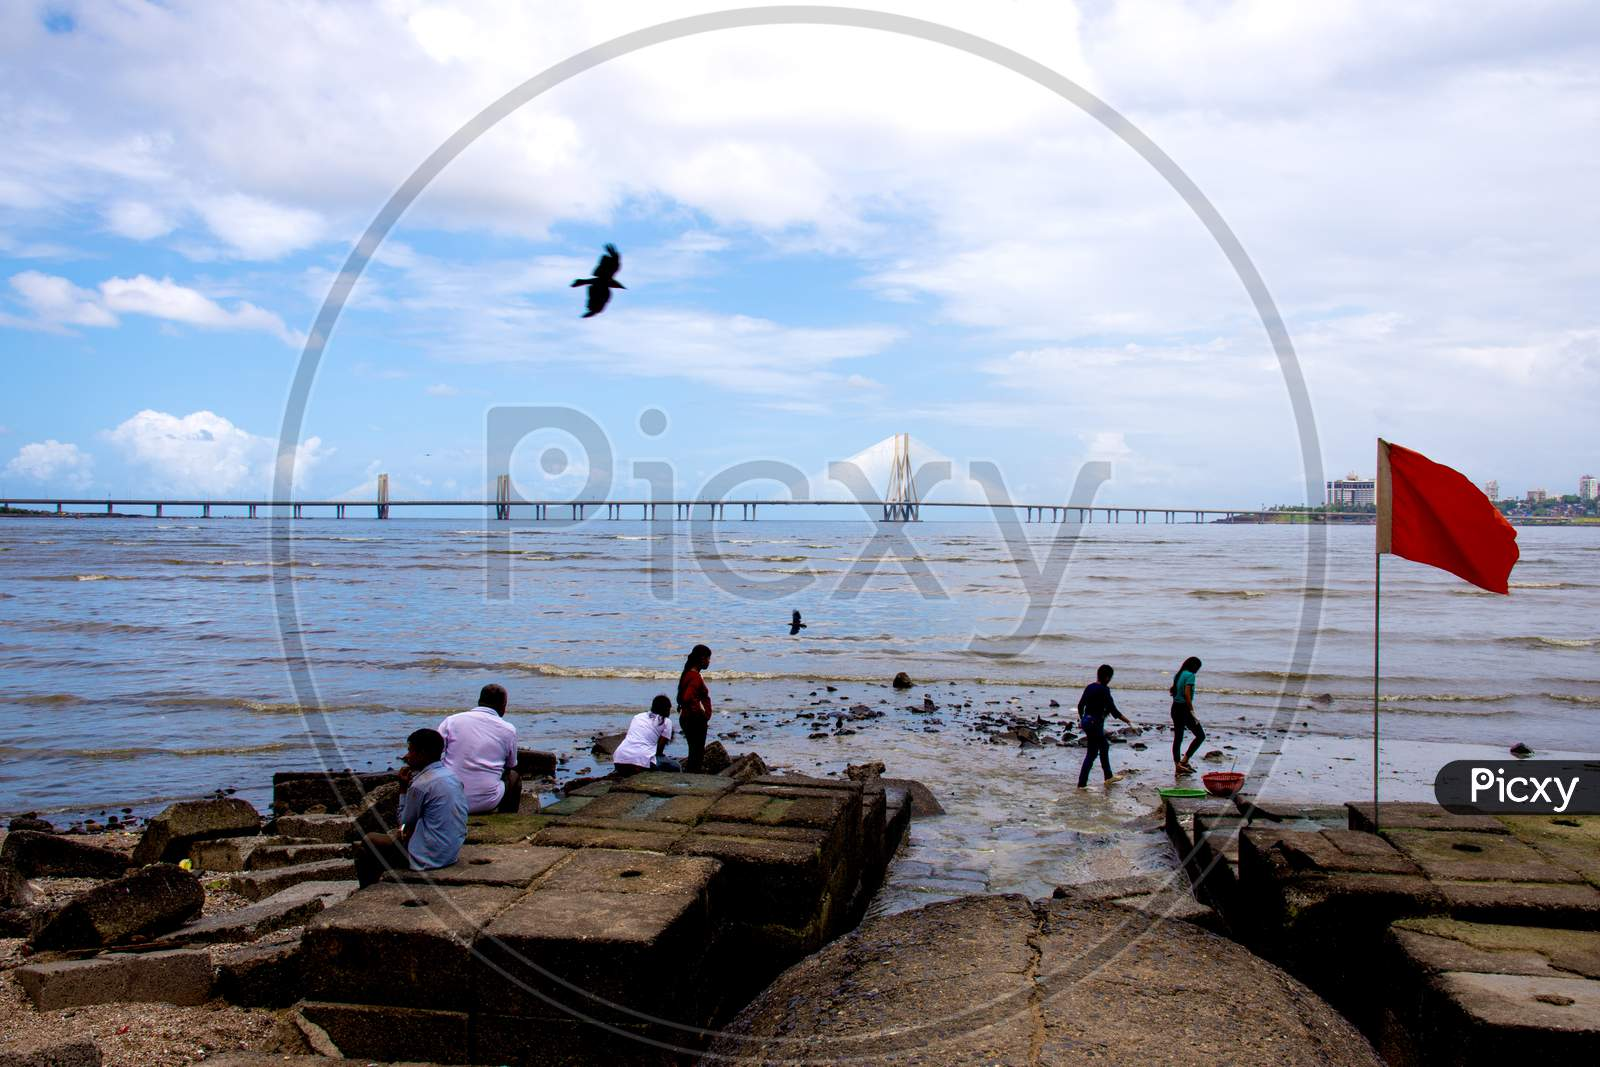 Volunteers helping to clean up the Mumbai dadar beach during rain